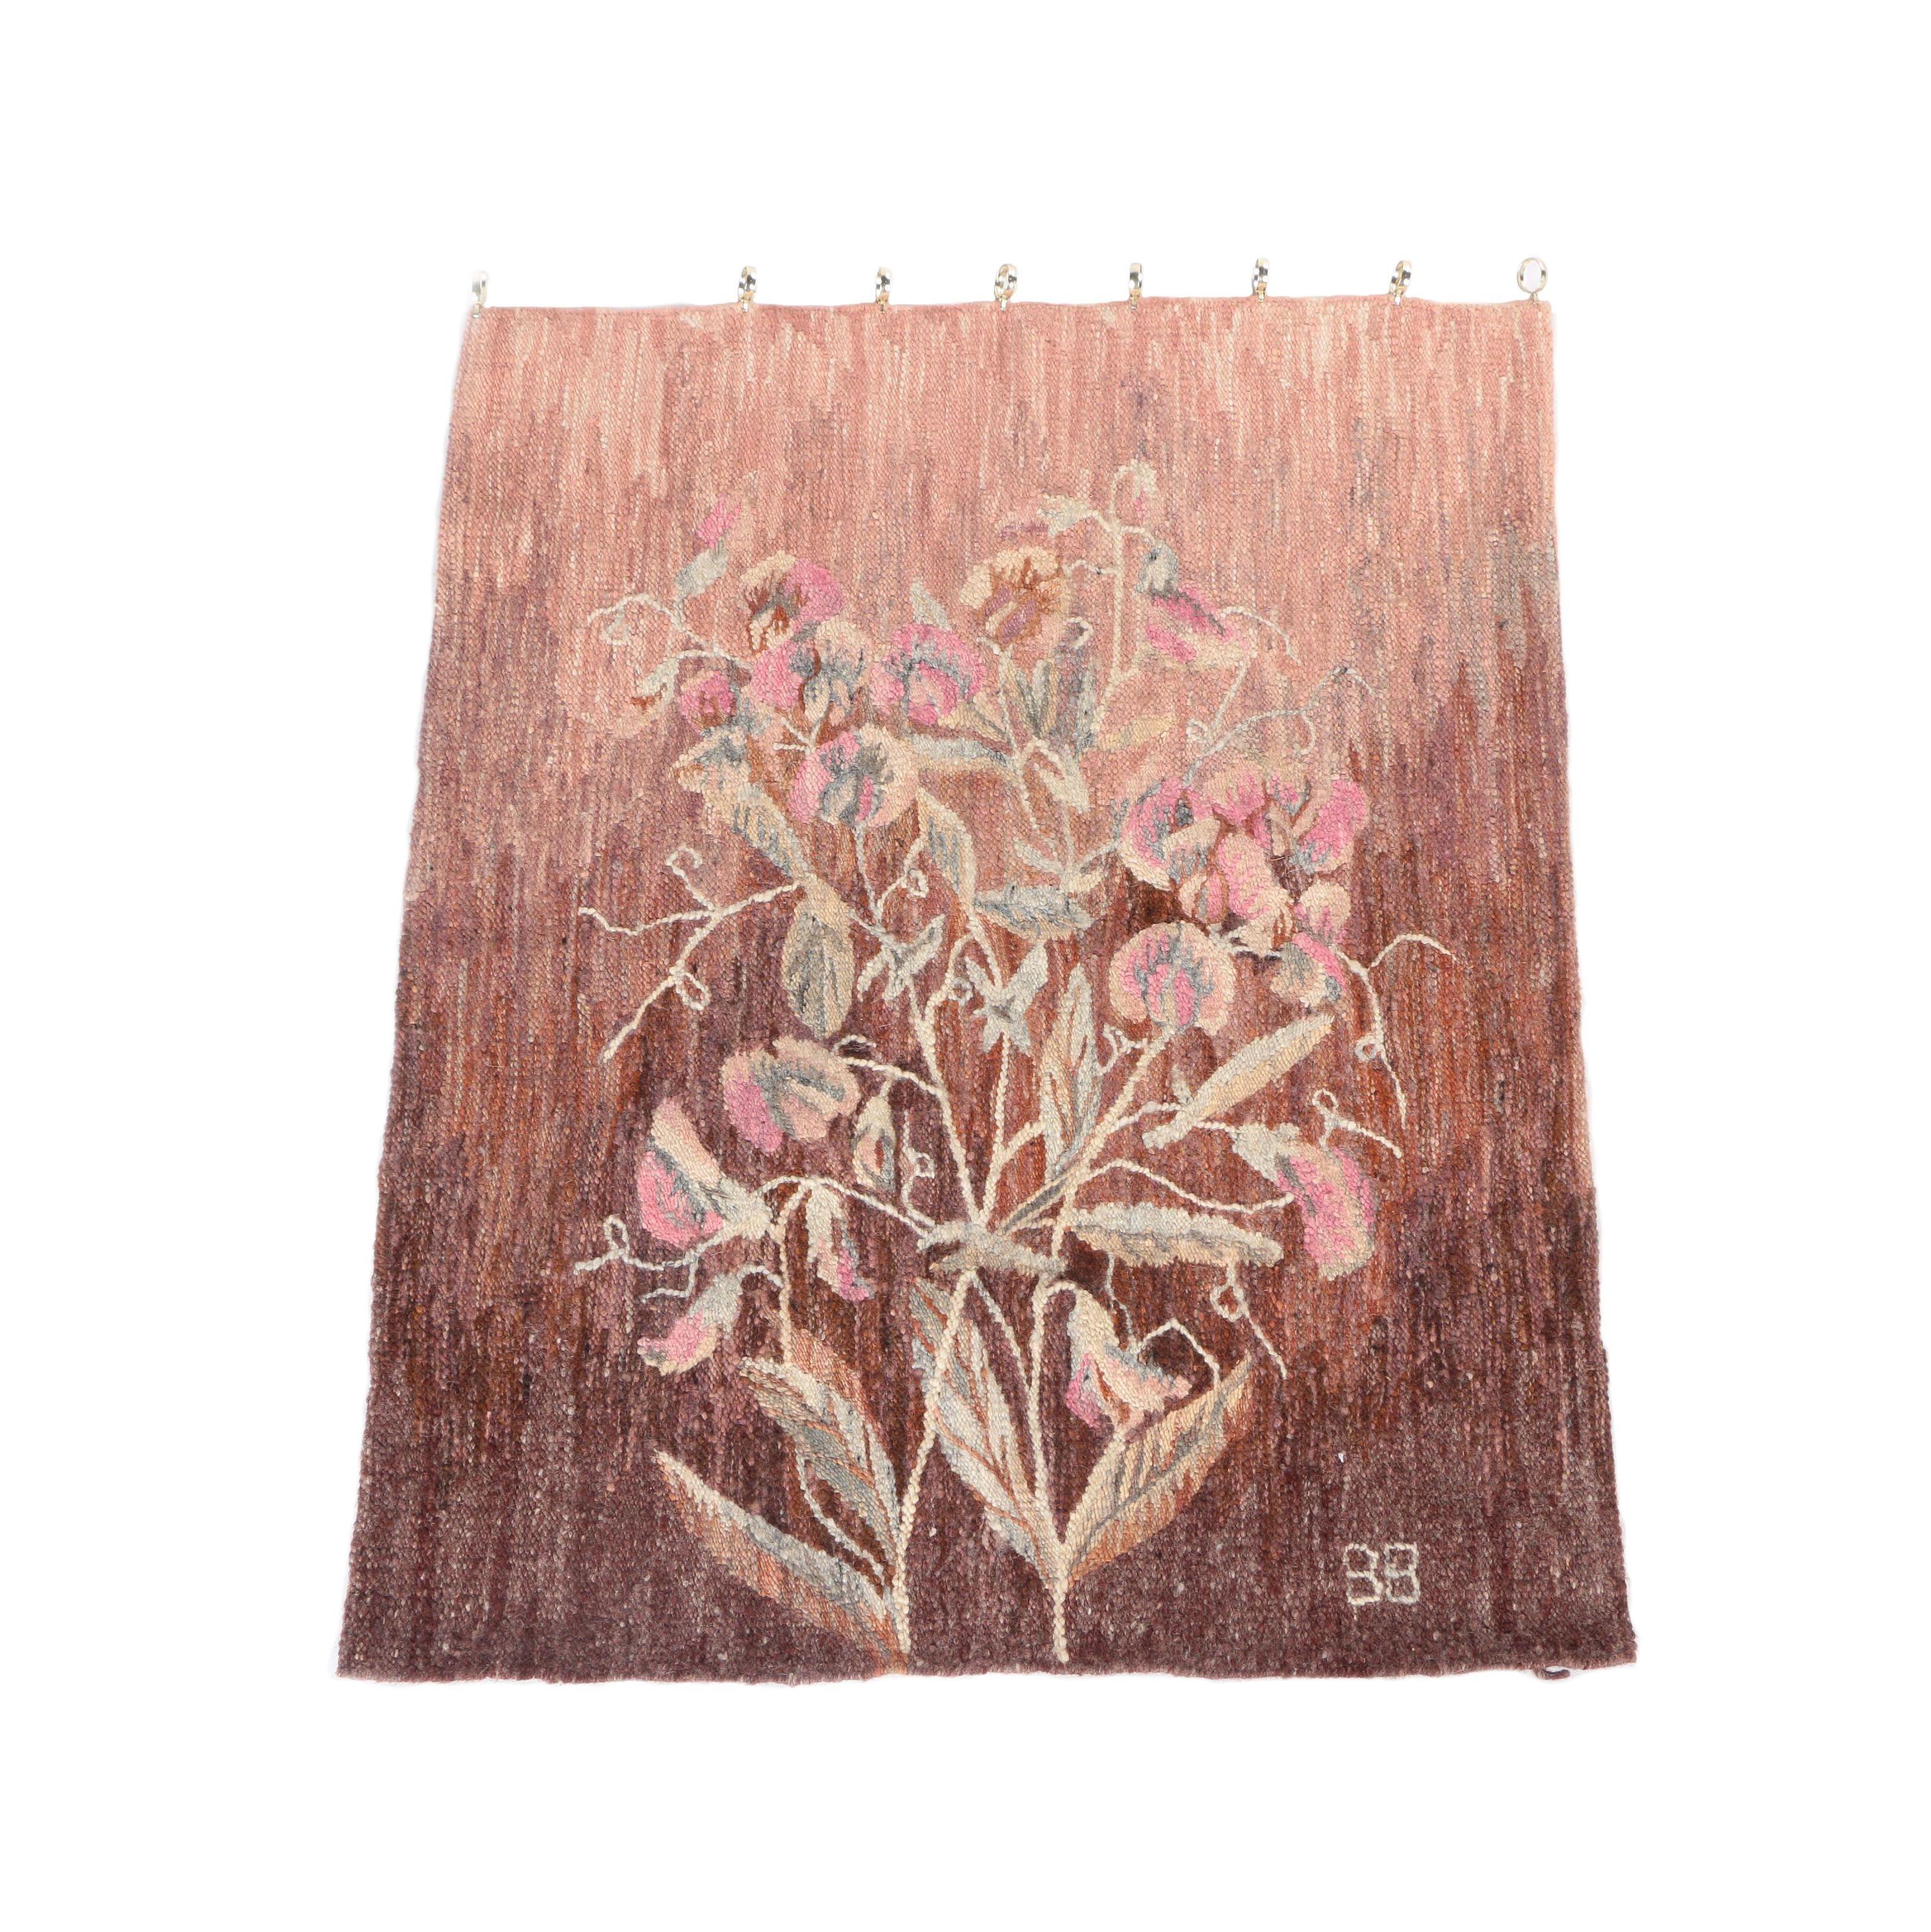 Handwoven Gobelin Groszki Polish Floral Weaving